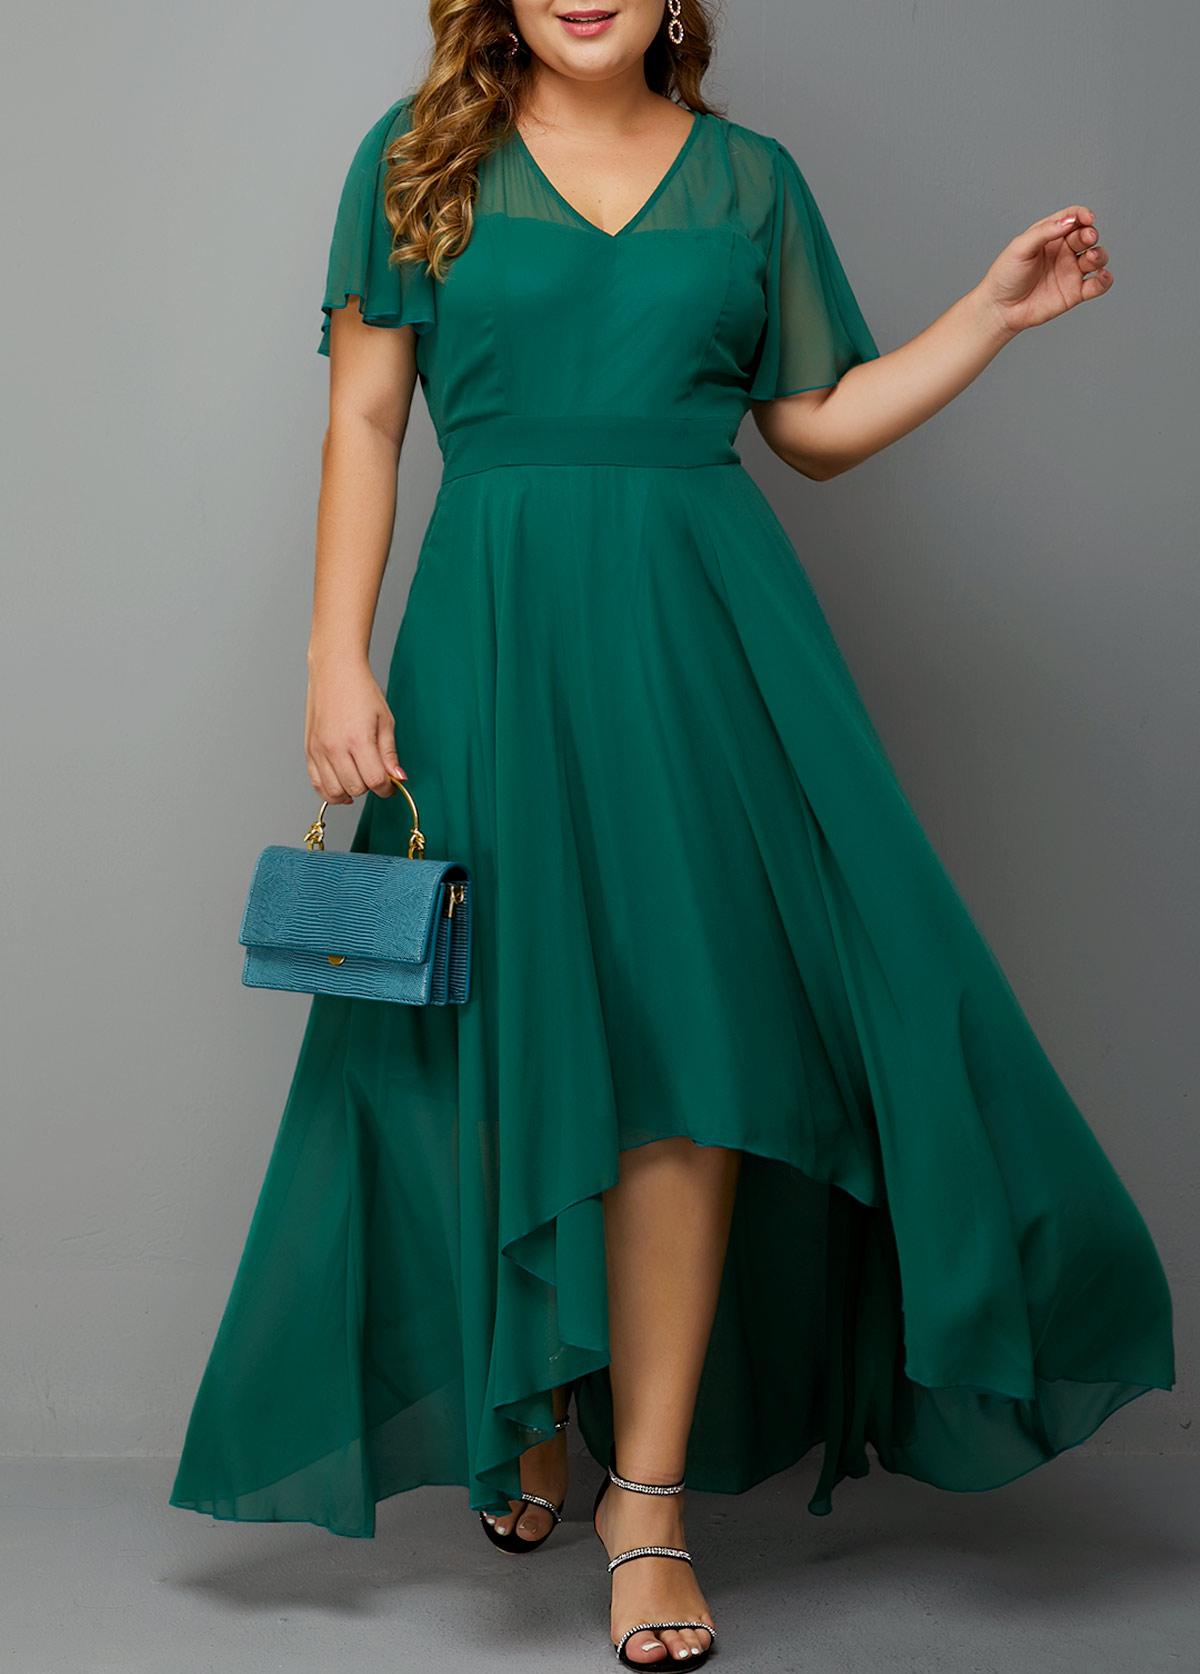 Plus Size Side Zipper High Waist Chiffon Dress